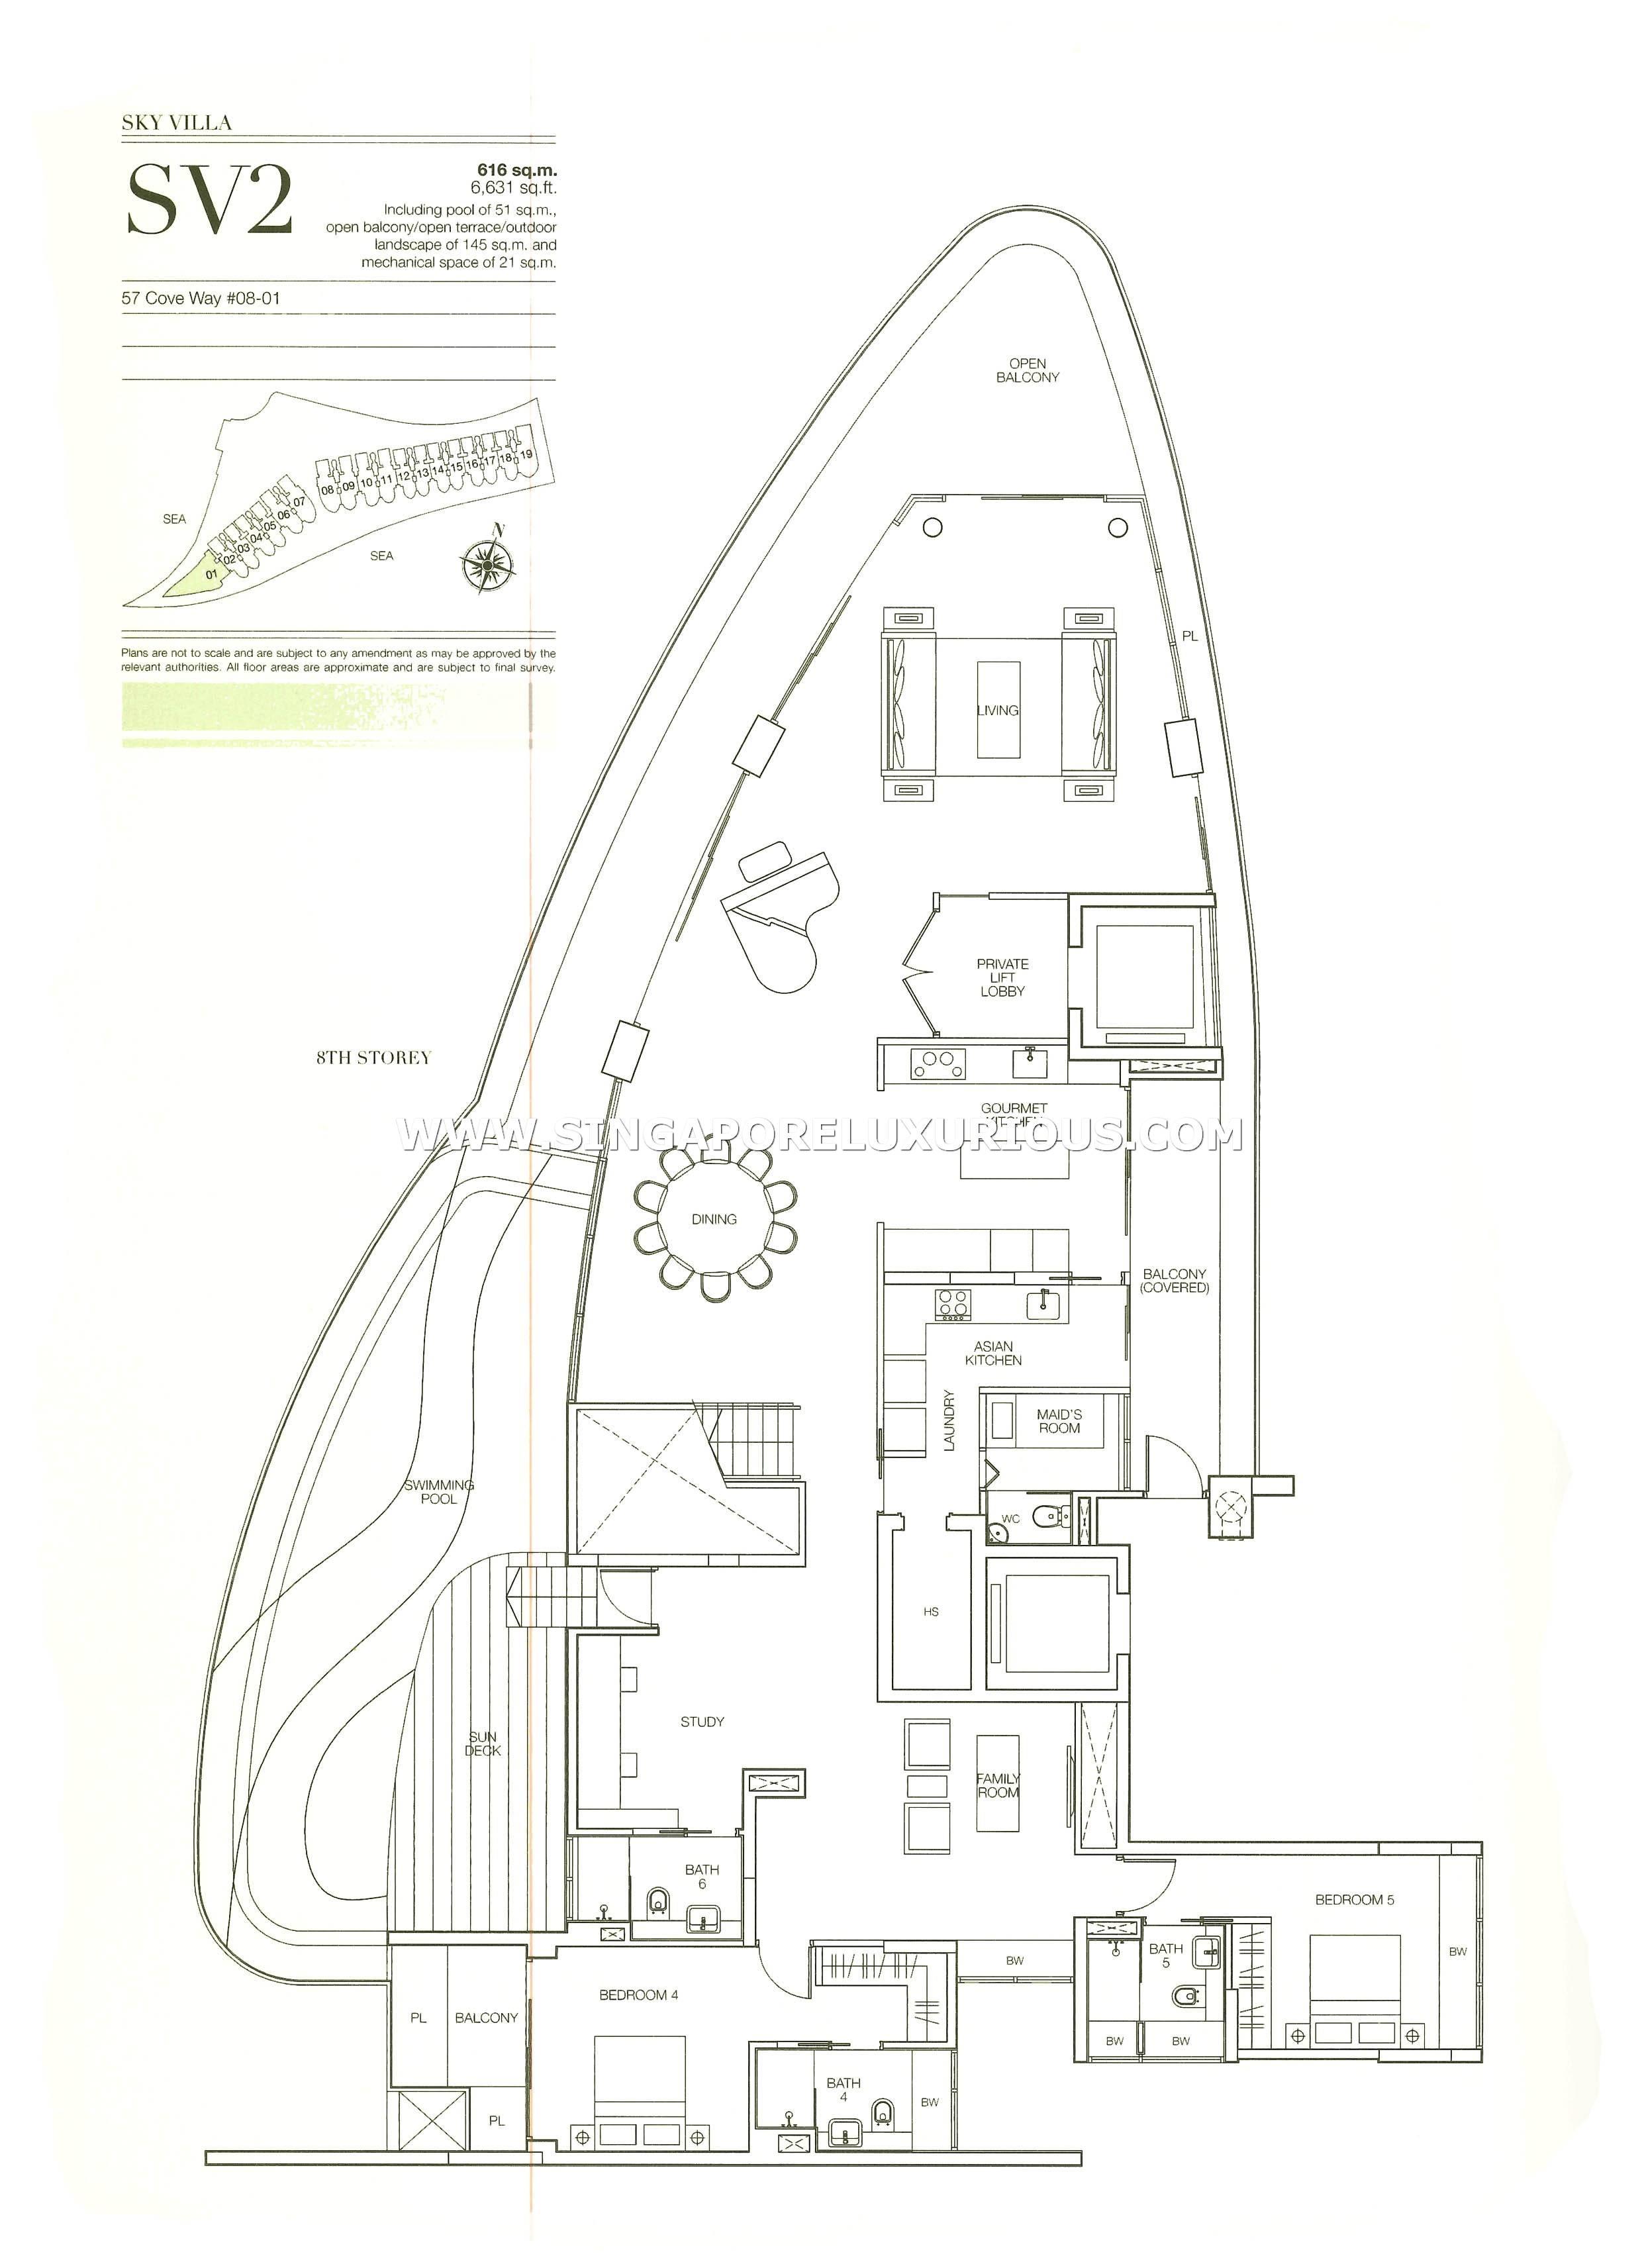 Seascape Sentosa Cove Site Amp Floor Plan Singapore